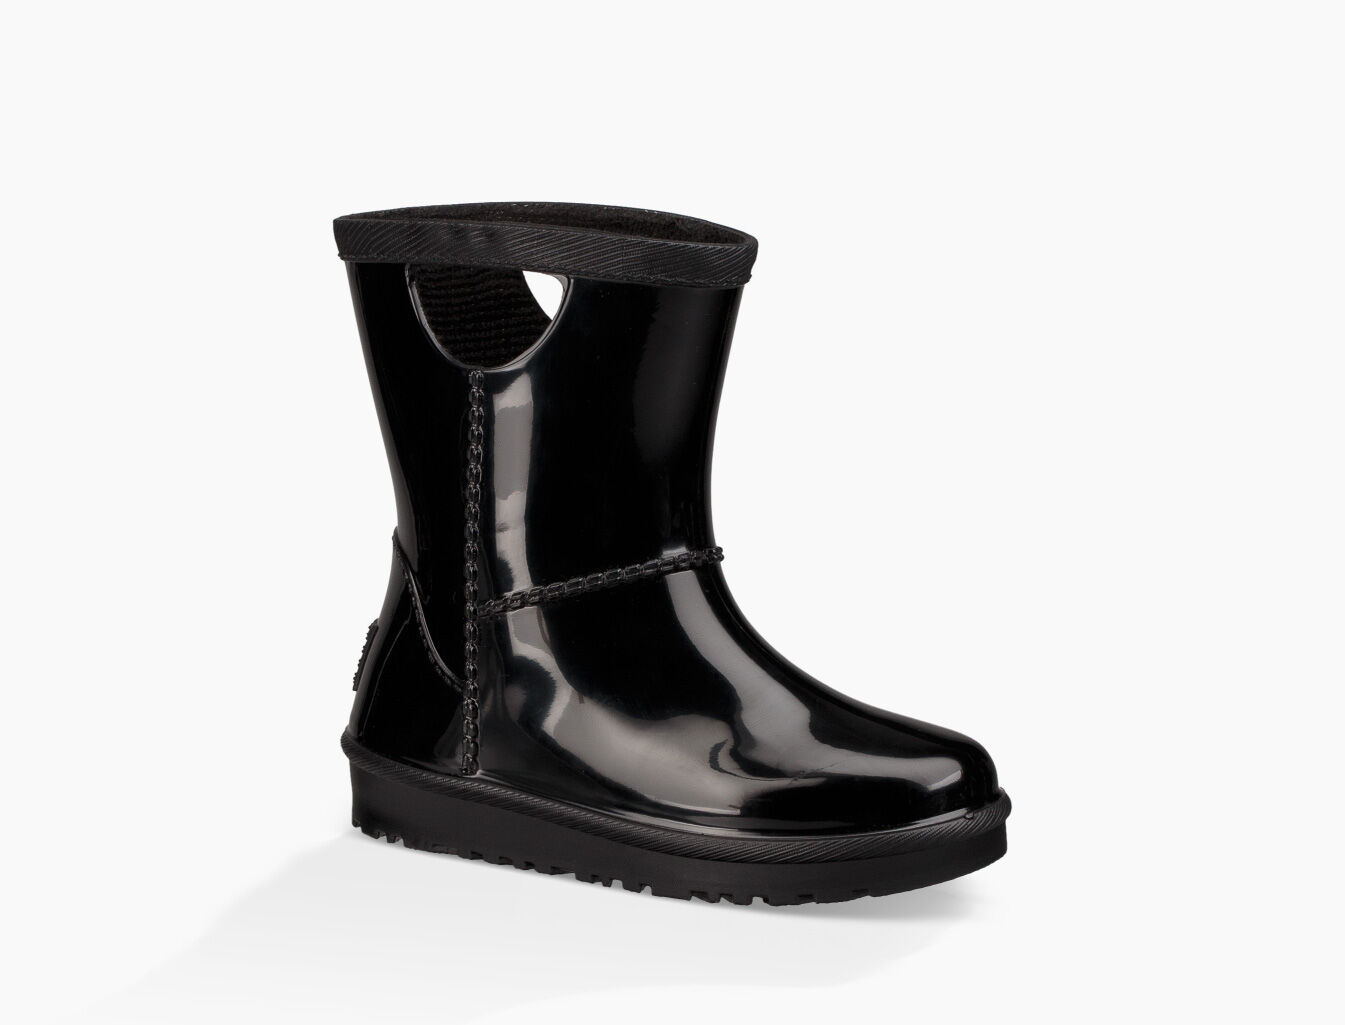 Rahjee Rain Boot for Toddlers | UGG